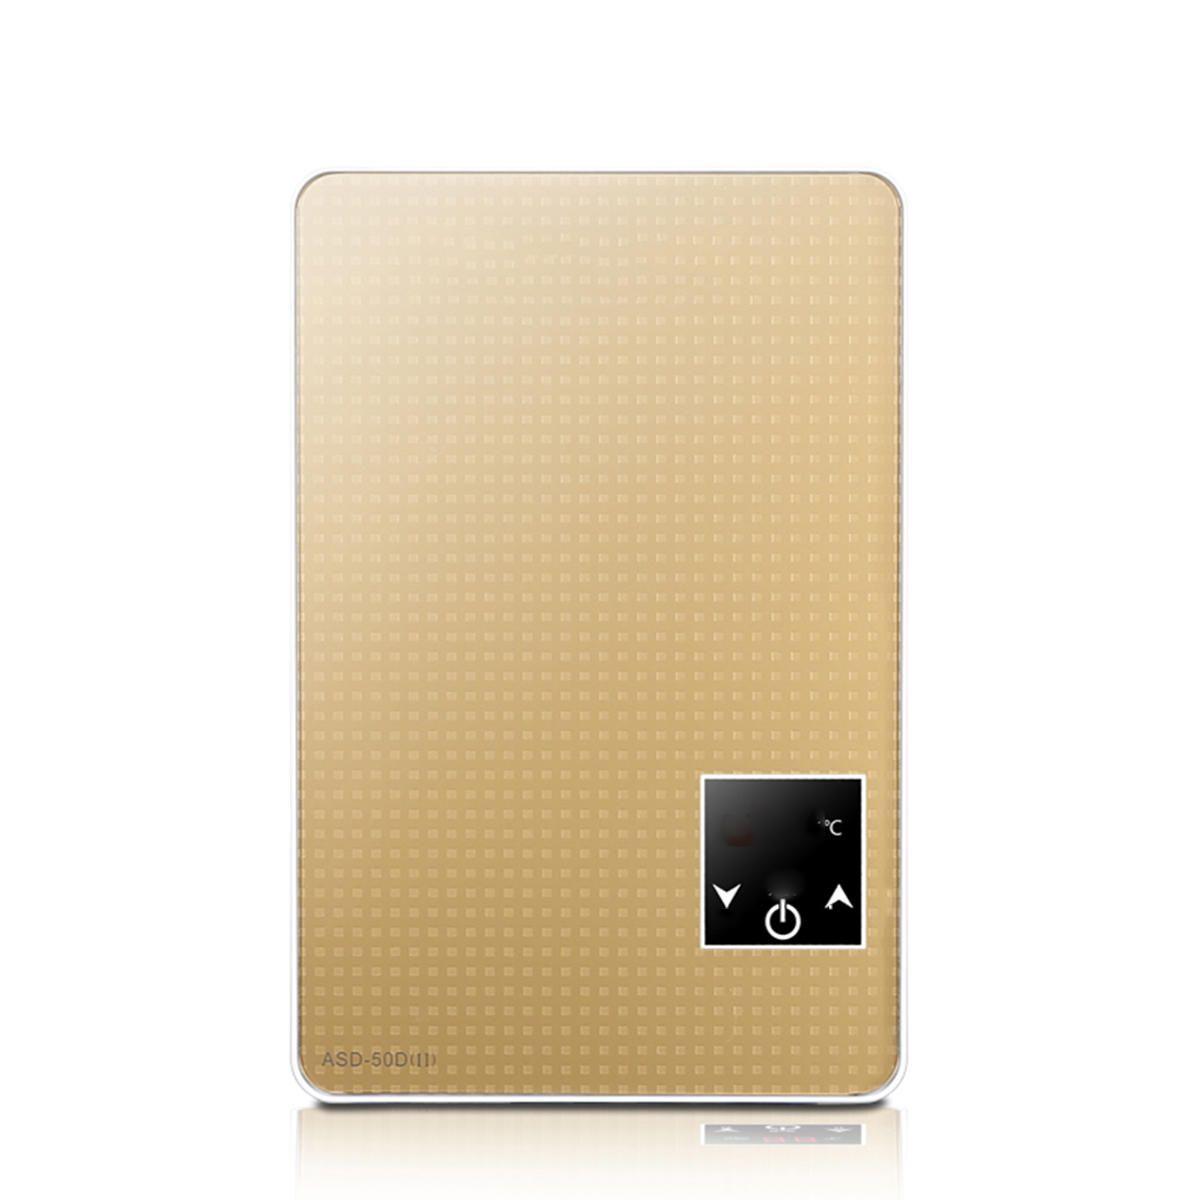 6500W Tankless Instant Electric Hot Water Heater Boiler Bathroom Shower Head Set